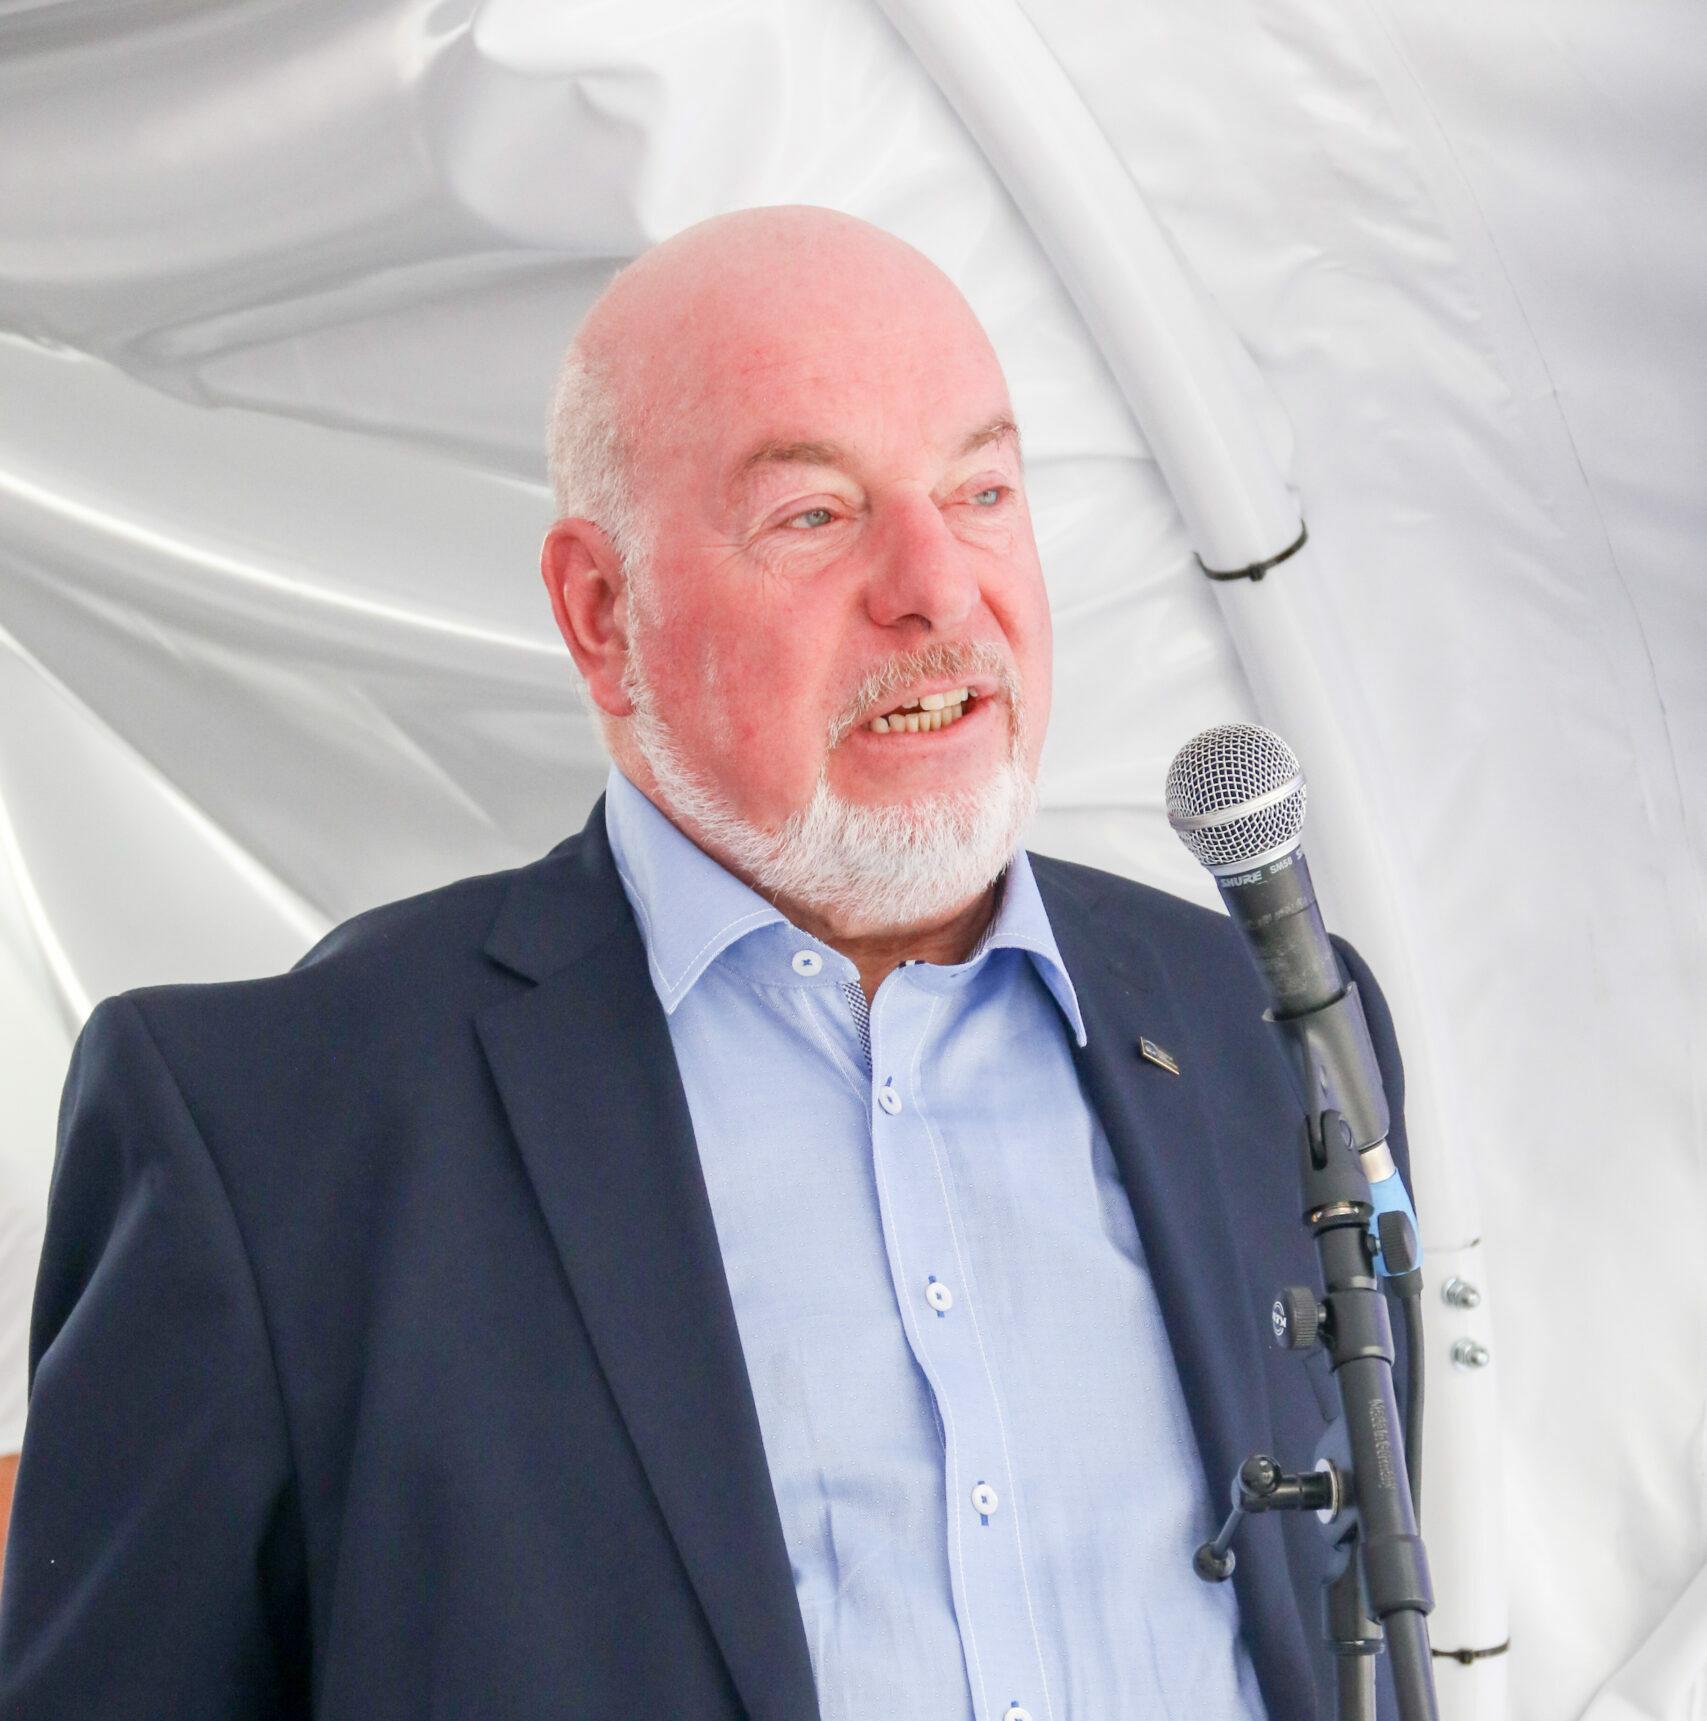 Dan Smyth - profile image